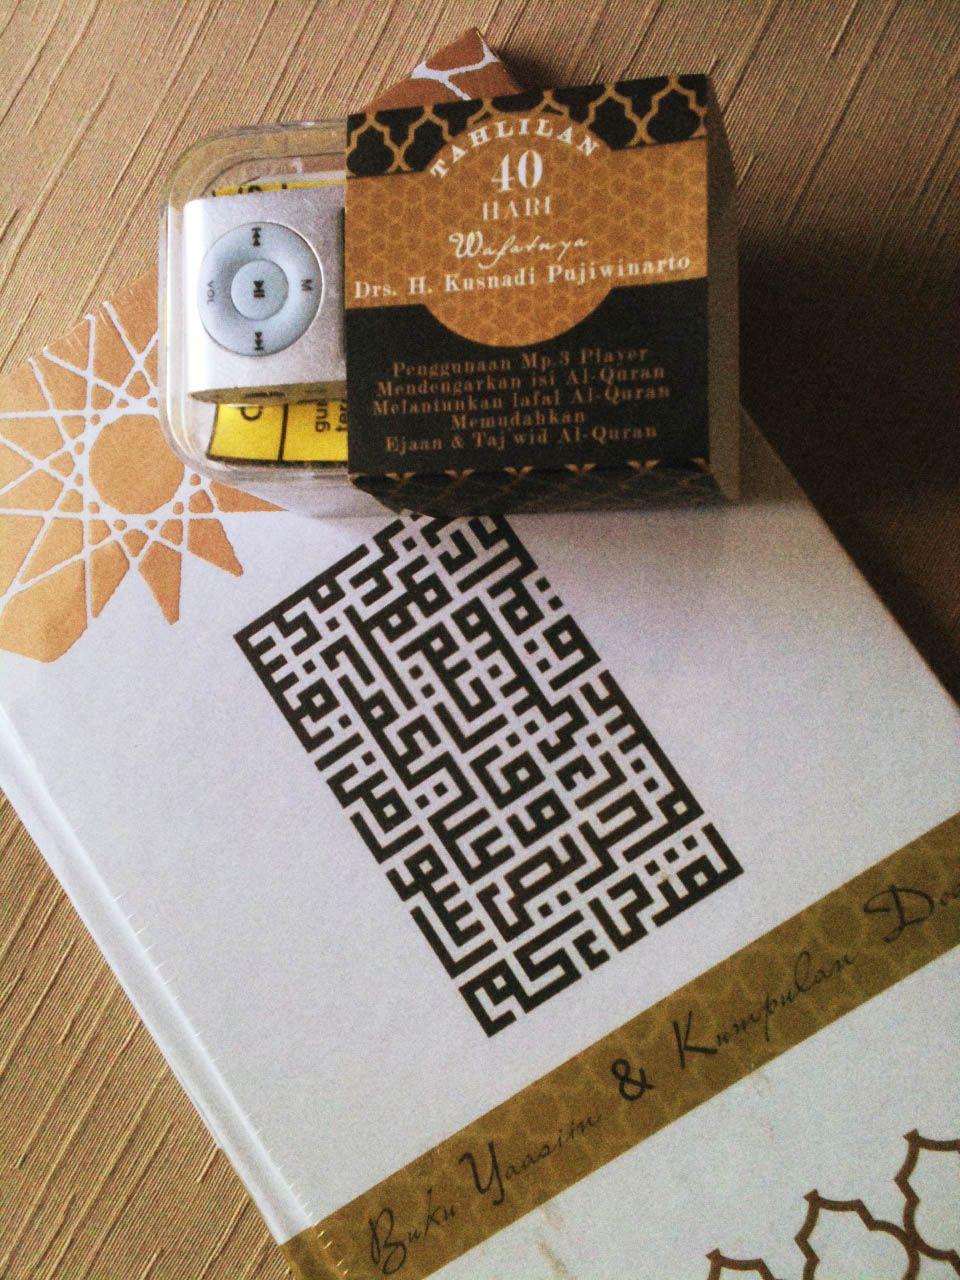 Background Cover Yasin : background, cover, yasin, Yasin, Tahlilan, Ayat-ayat, Al-Qur'an, Email, Order, 8thtree@gmail.com, #Maroko#Buku#Yasin, Buku,, Qur'an,, Maroko